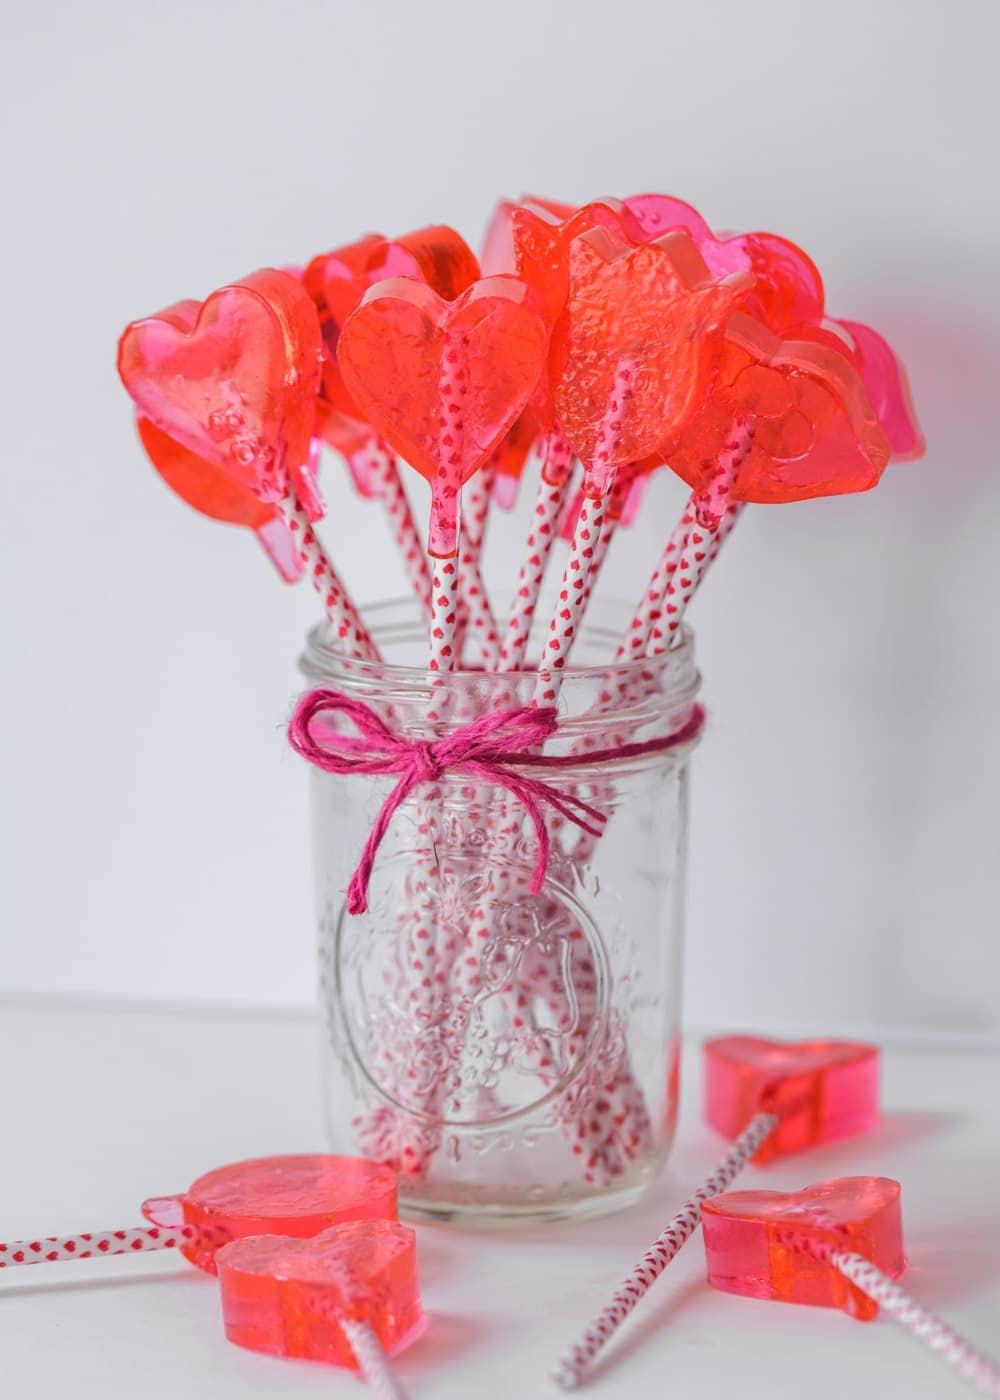 Pink homemade suckers in a mason jar